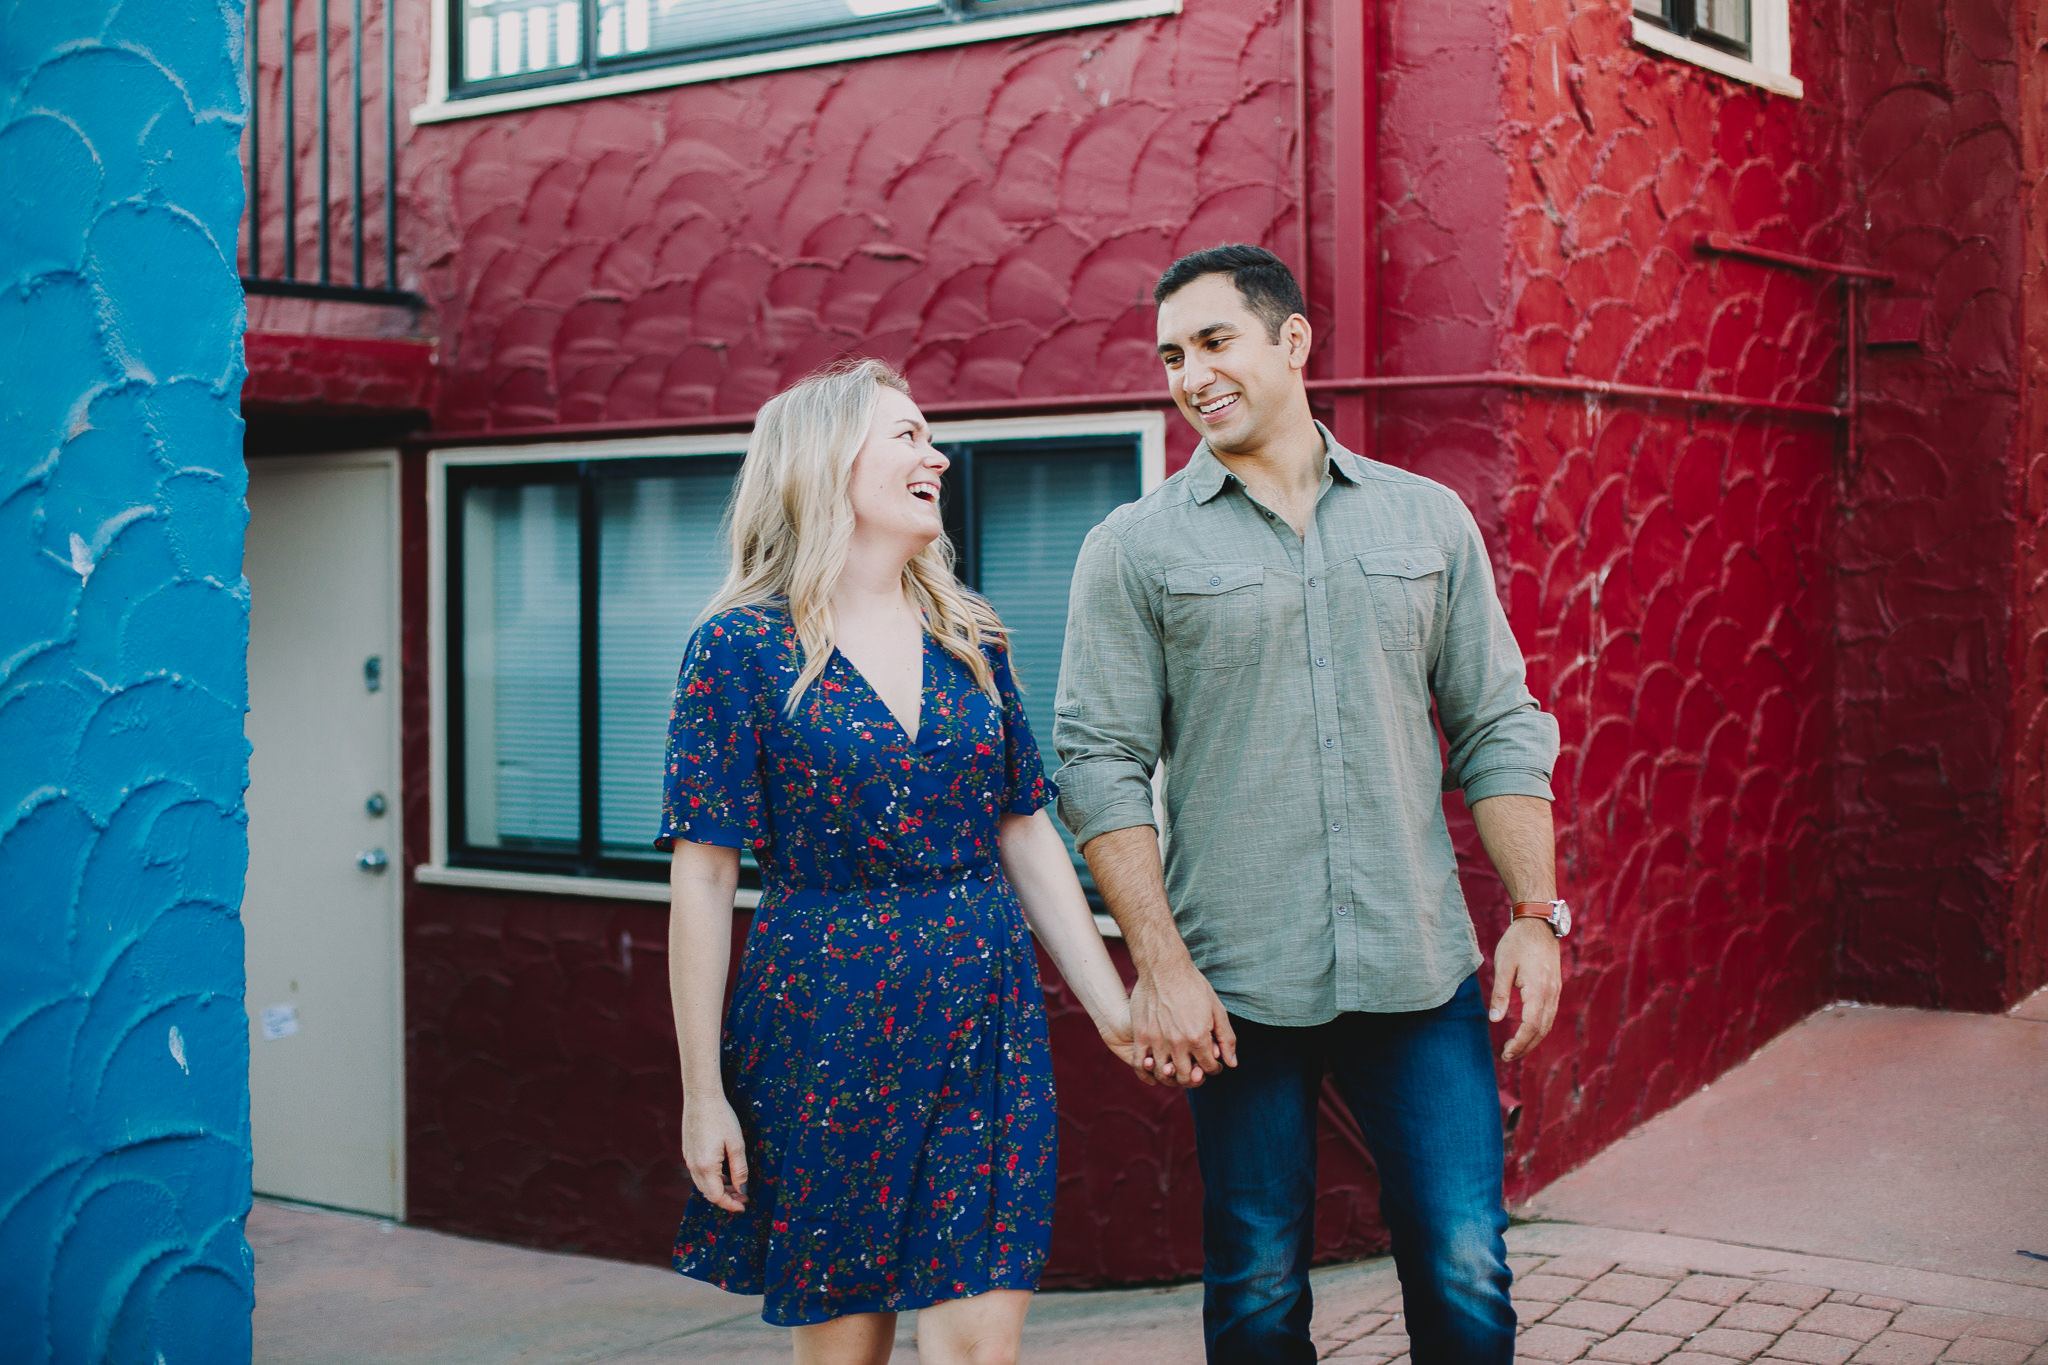 Archer Inspired Photography Capitola Beach Santa Cruz Wedding Engagement Lifestyle Session Photographer-71.jpg